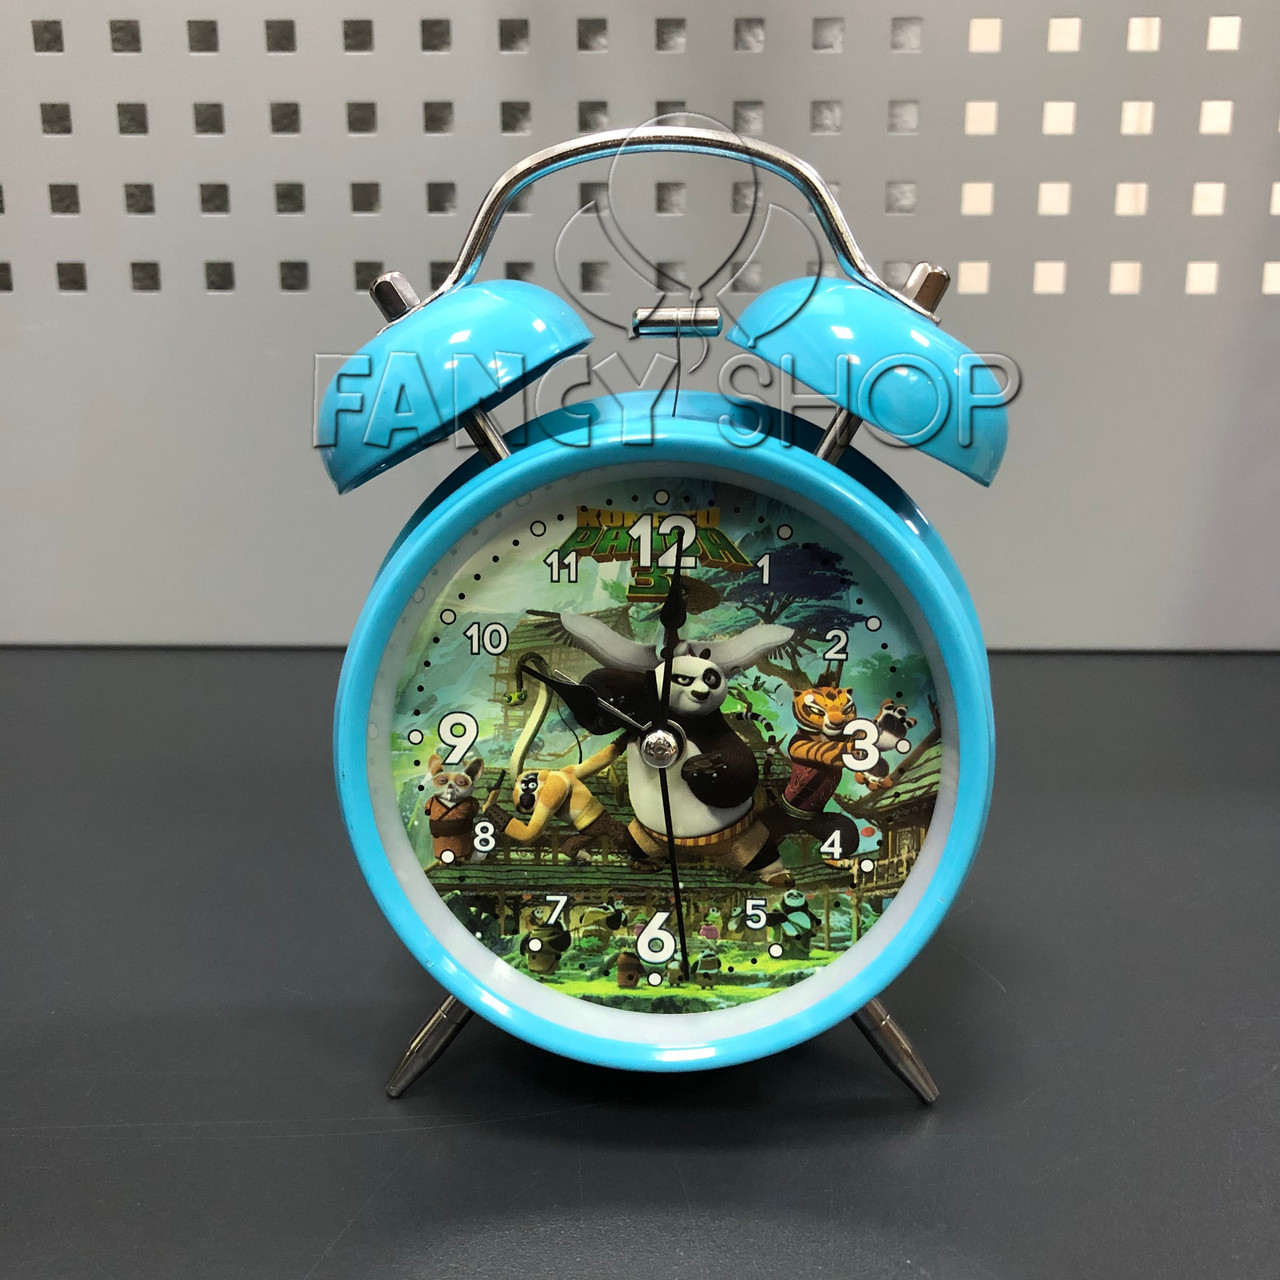 "Будильник кварцовий ""Панда Кунг-фу"", блакитний, великий, Будильник ""Панда Кунг-фу"" 0052-9"